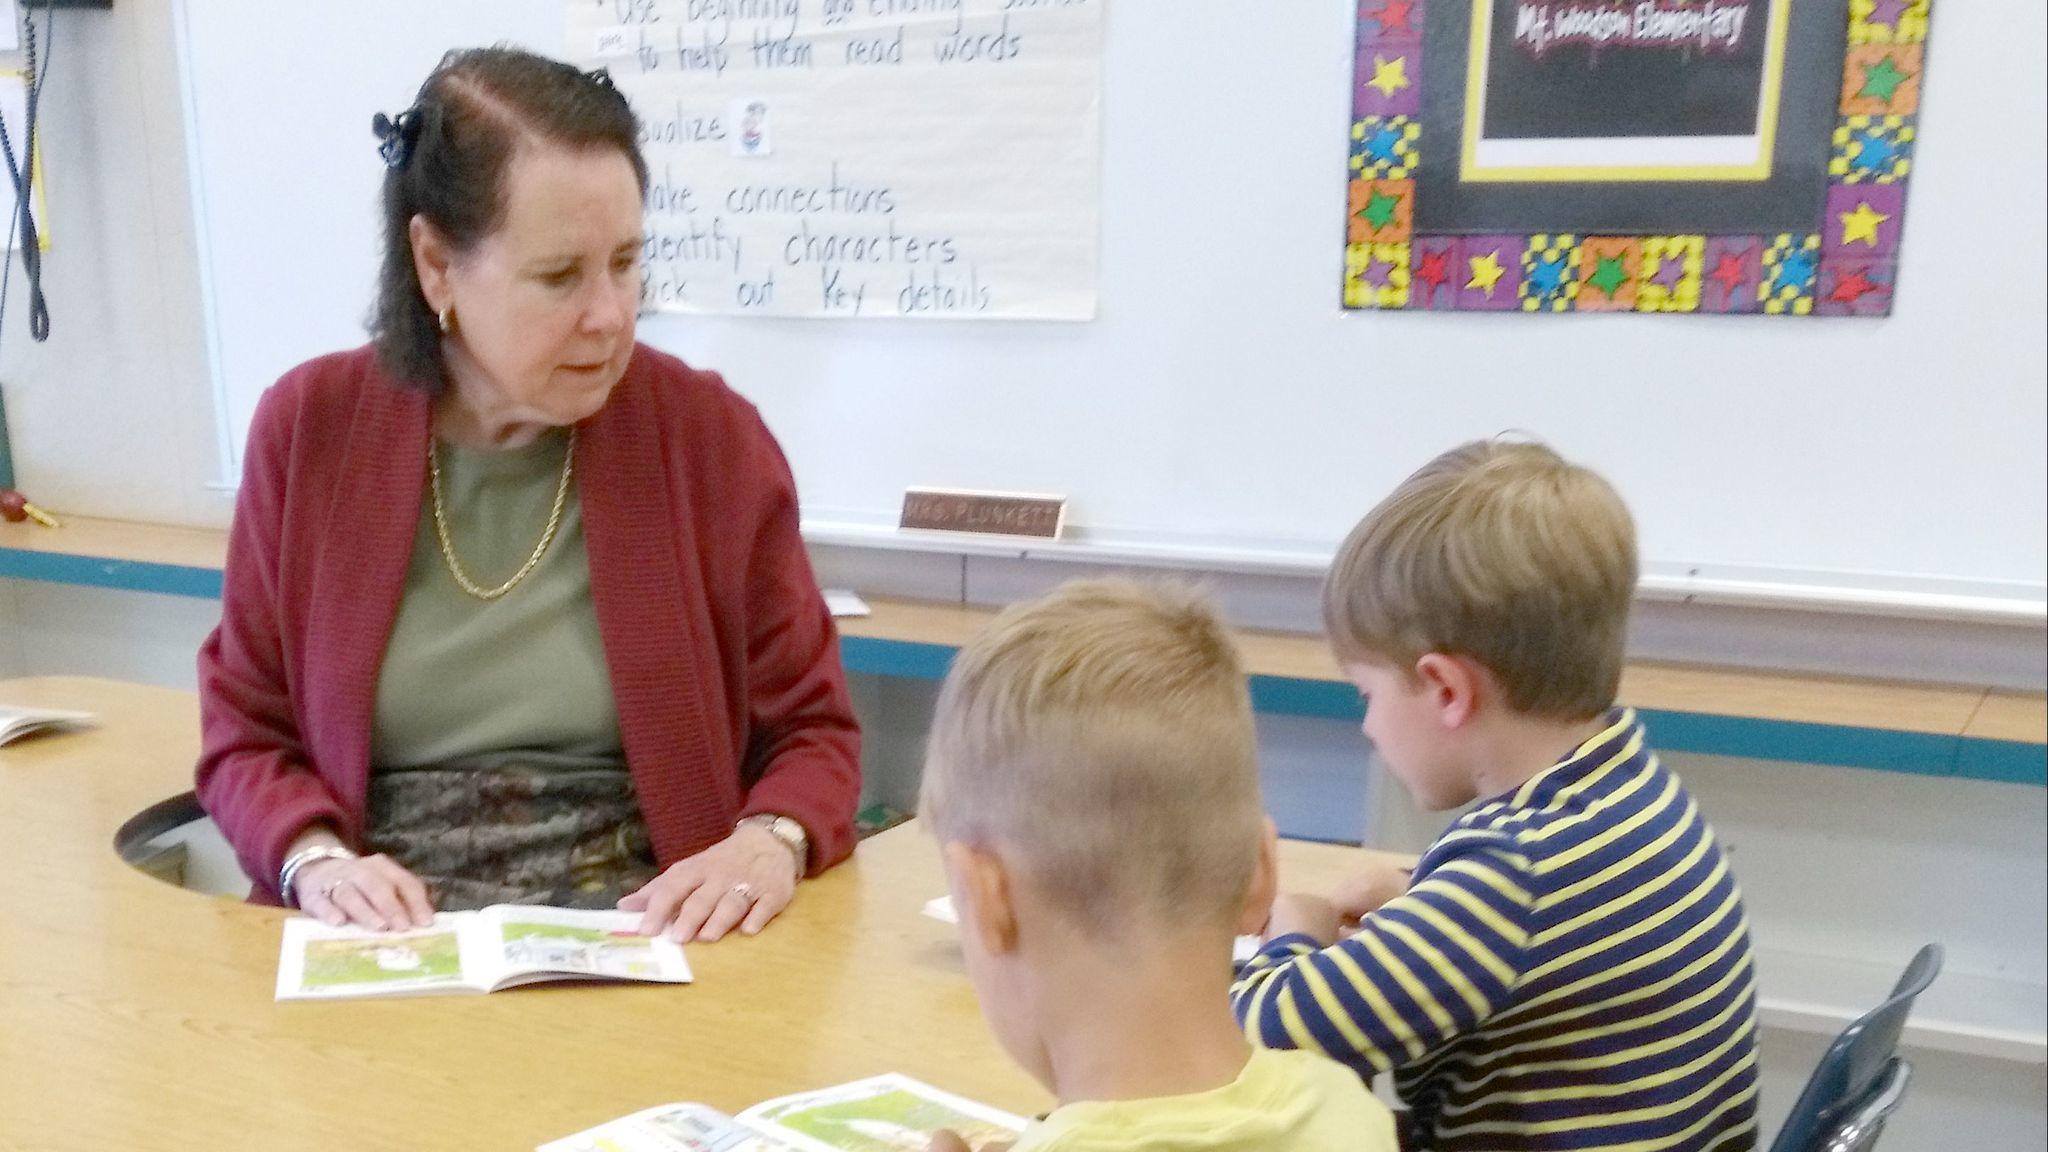 Leanne Plunkett said volunteering in the kindergarten classrooms at Mt. Woodson Elementary School brings great joy to her life.